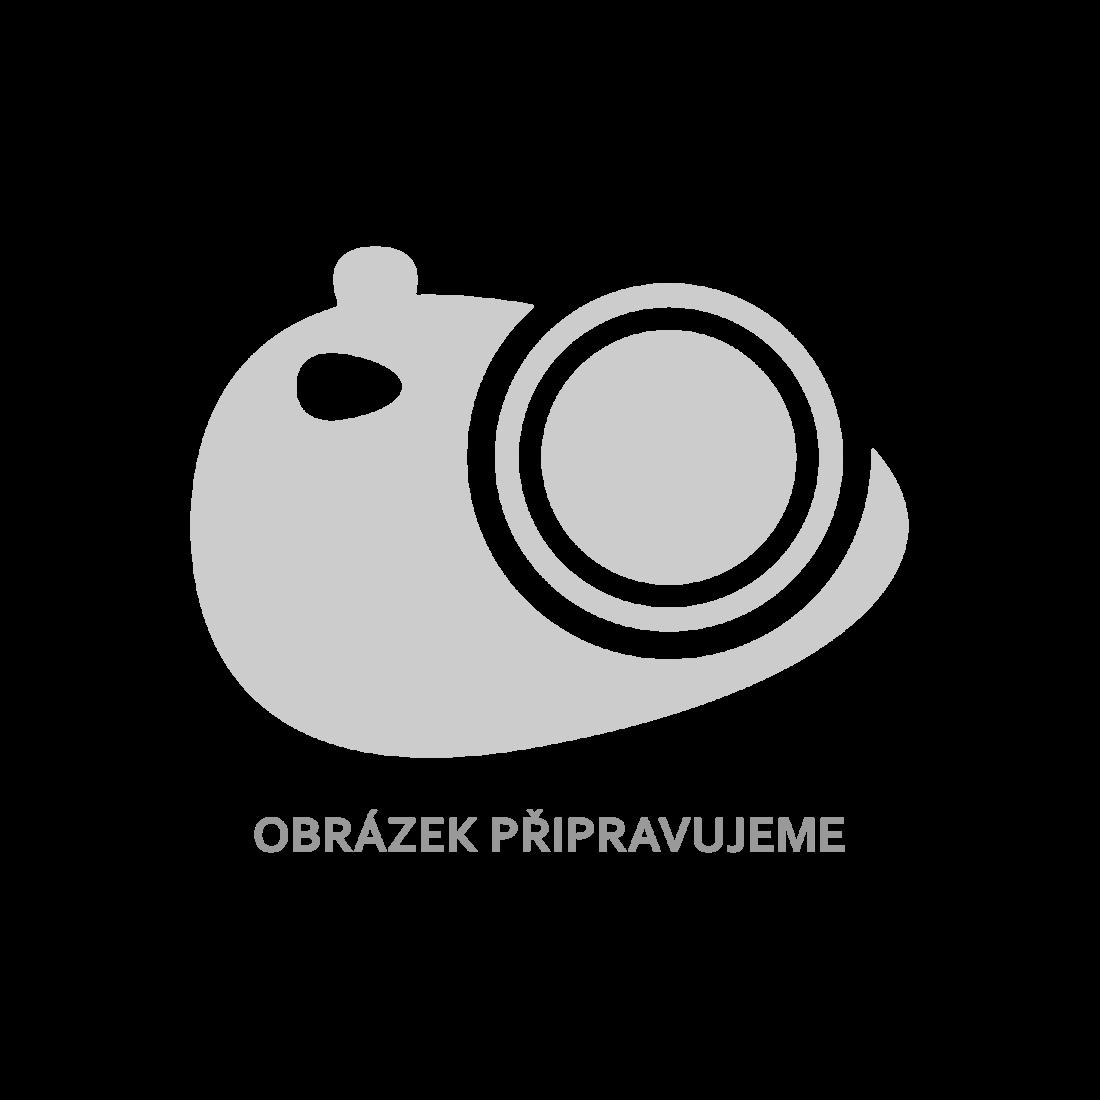 vidaXL Konferenční stolek bílý a dub sonoma 60x60x42 cm dřevotříska [800212]